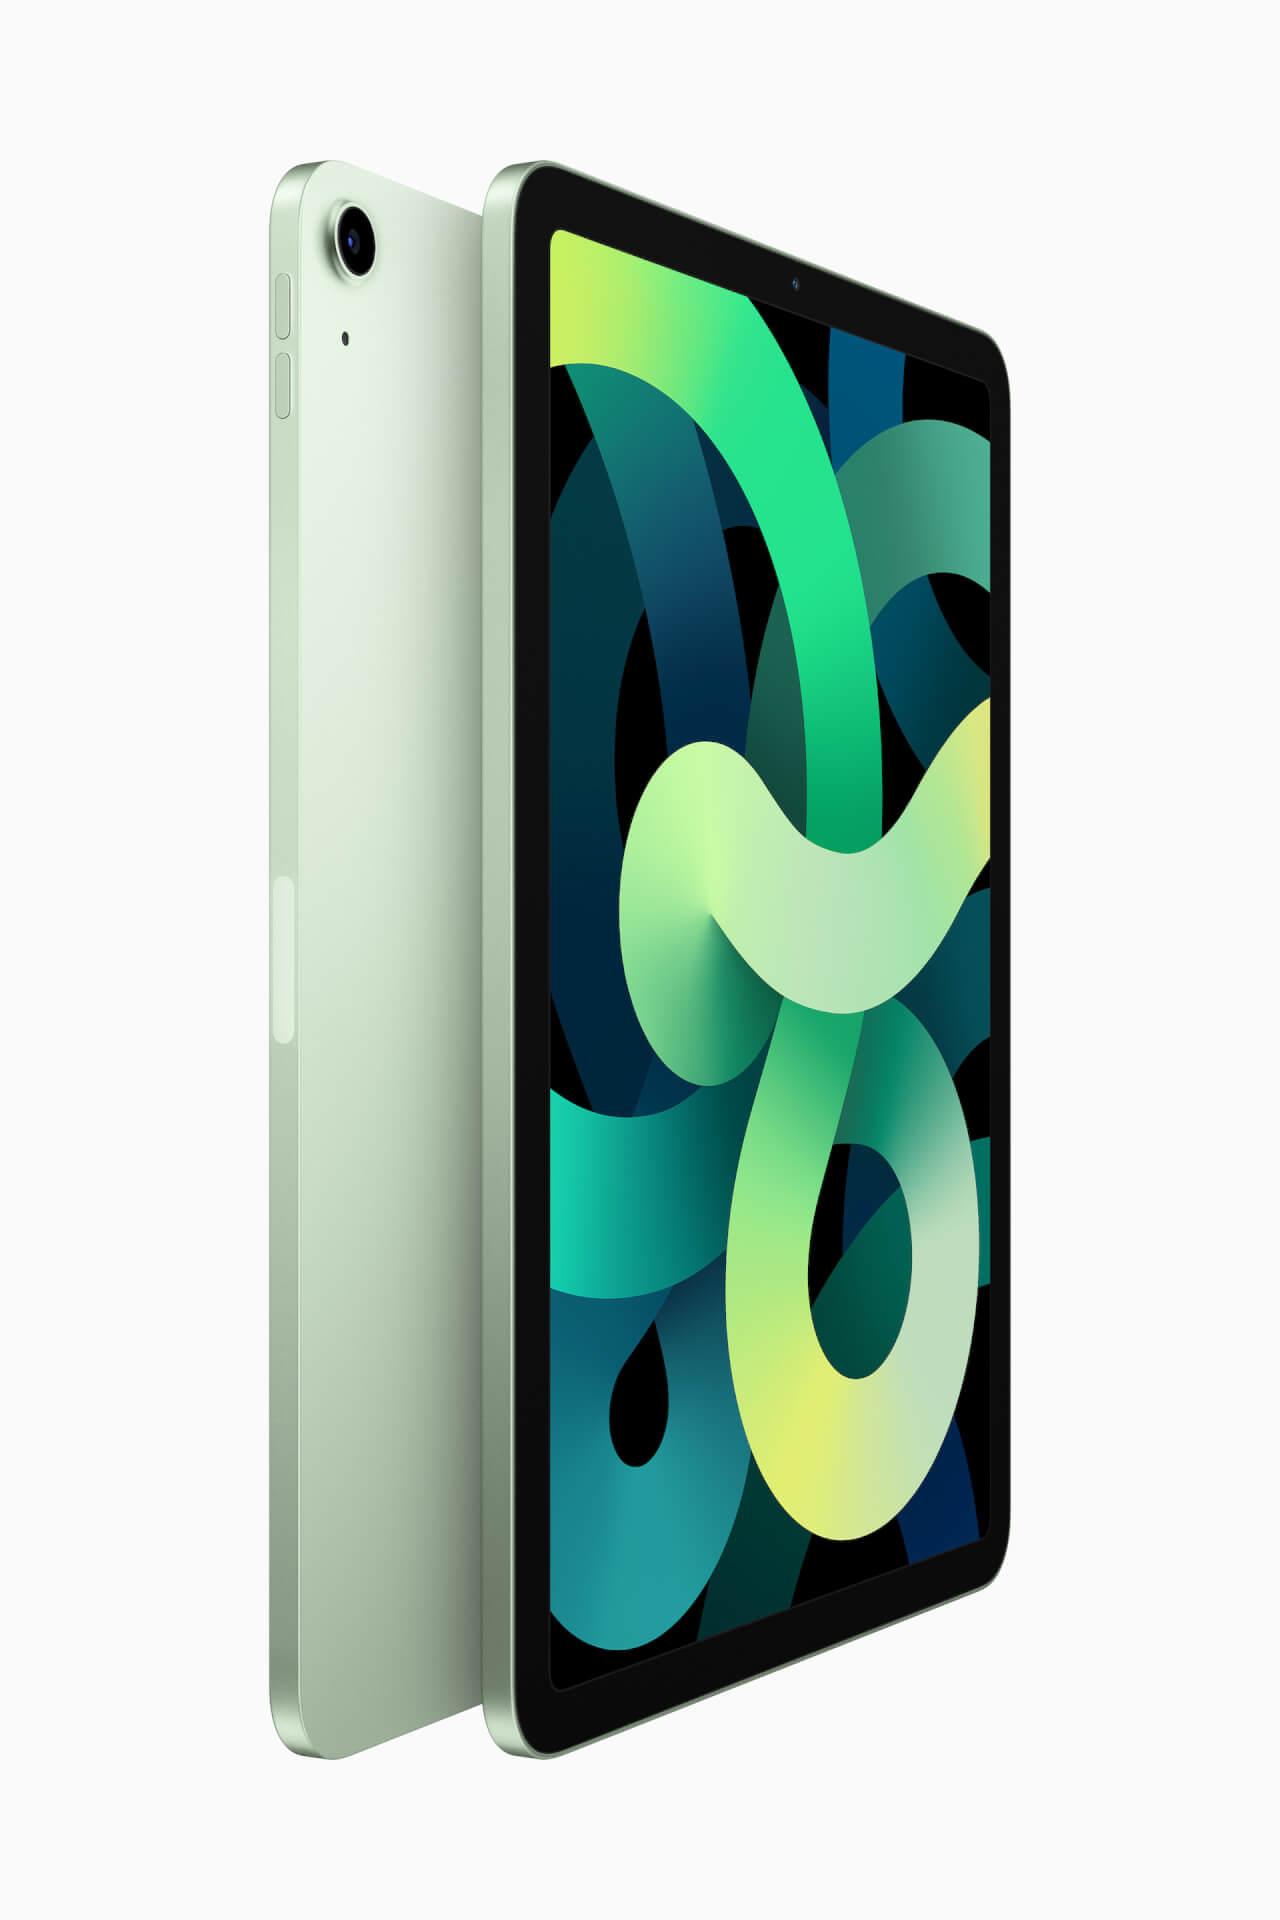 OLED搭載iPad Airが来年登場!?新型MacBook AirにはミニLEDを採用か tech210318_ipadair_macbookair_main